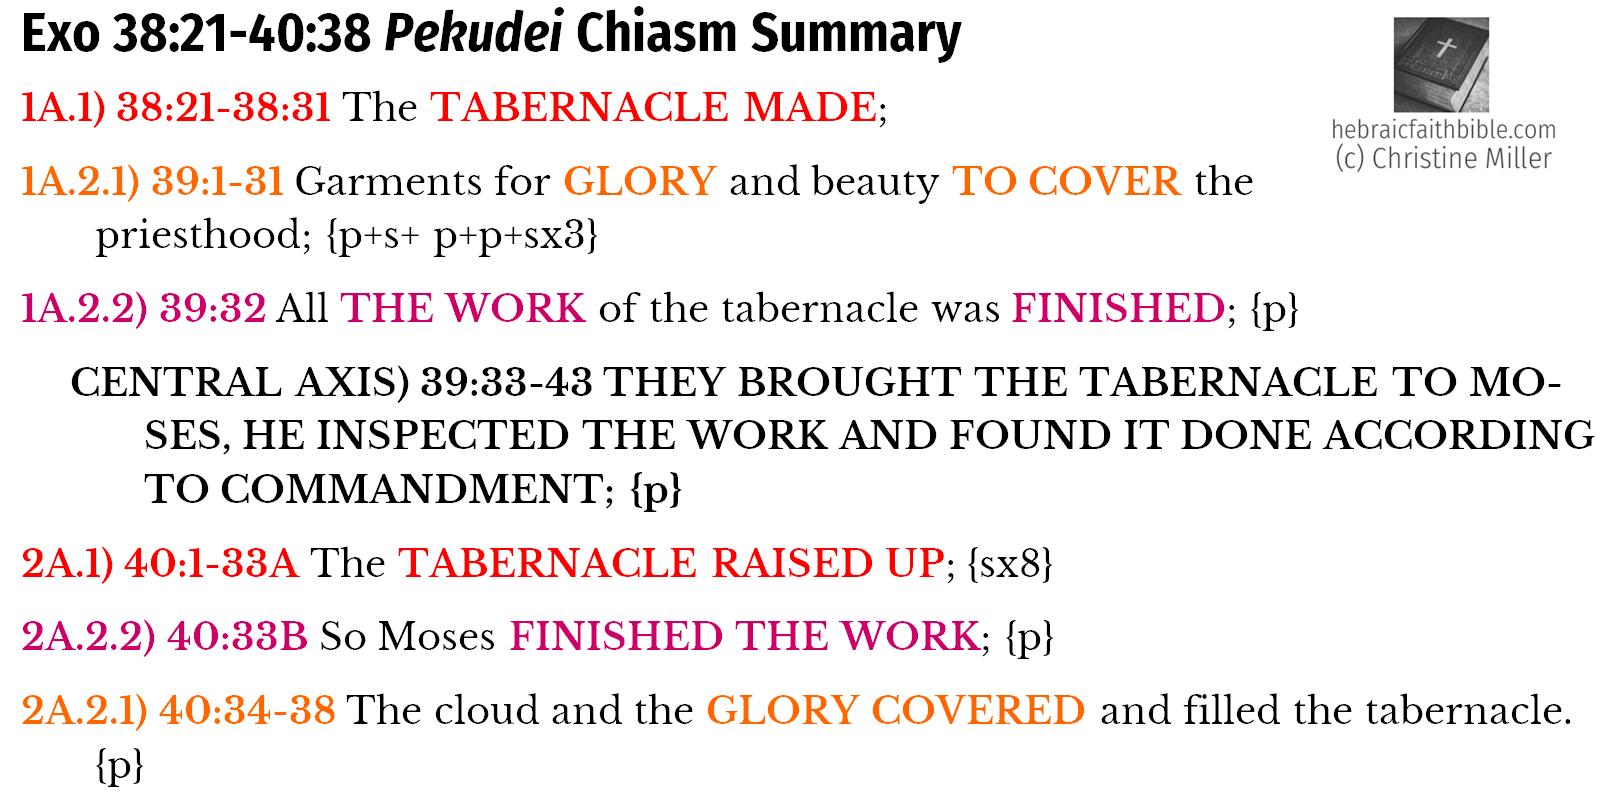 Exo 38:21-40:38 Pekudei summary chiasm | hebraicfaithbible.com